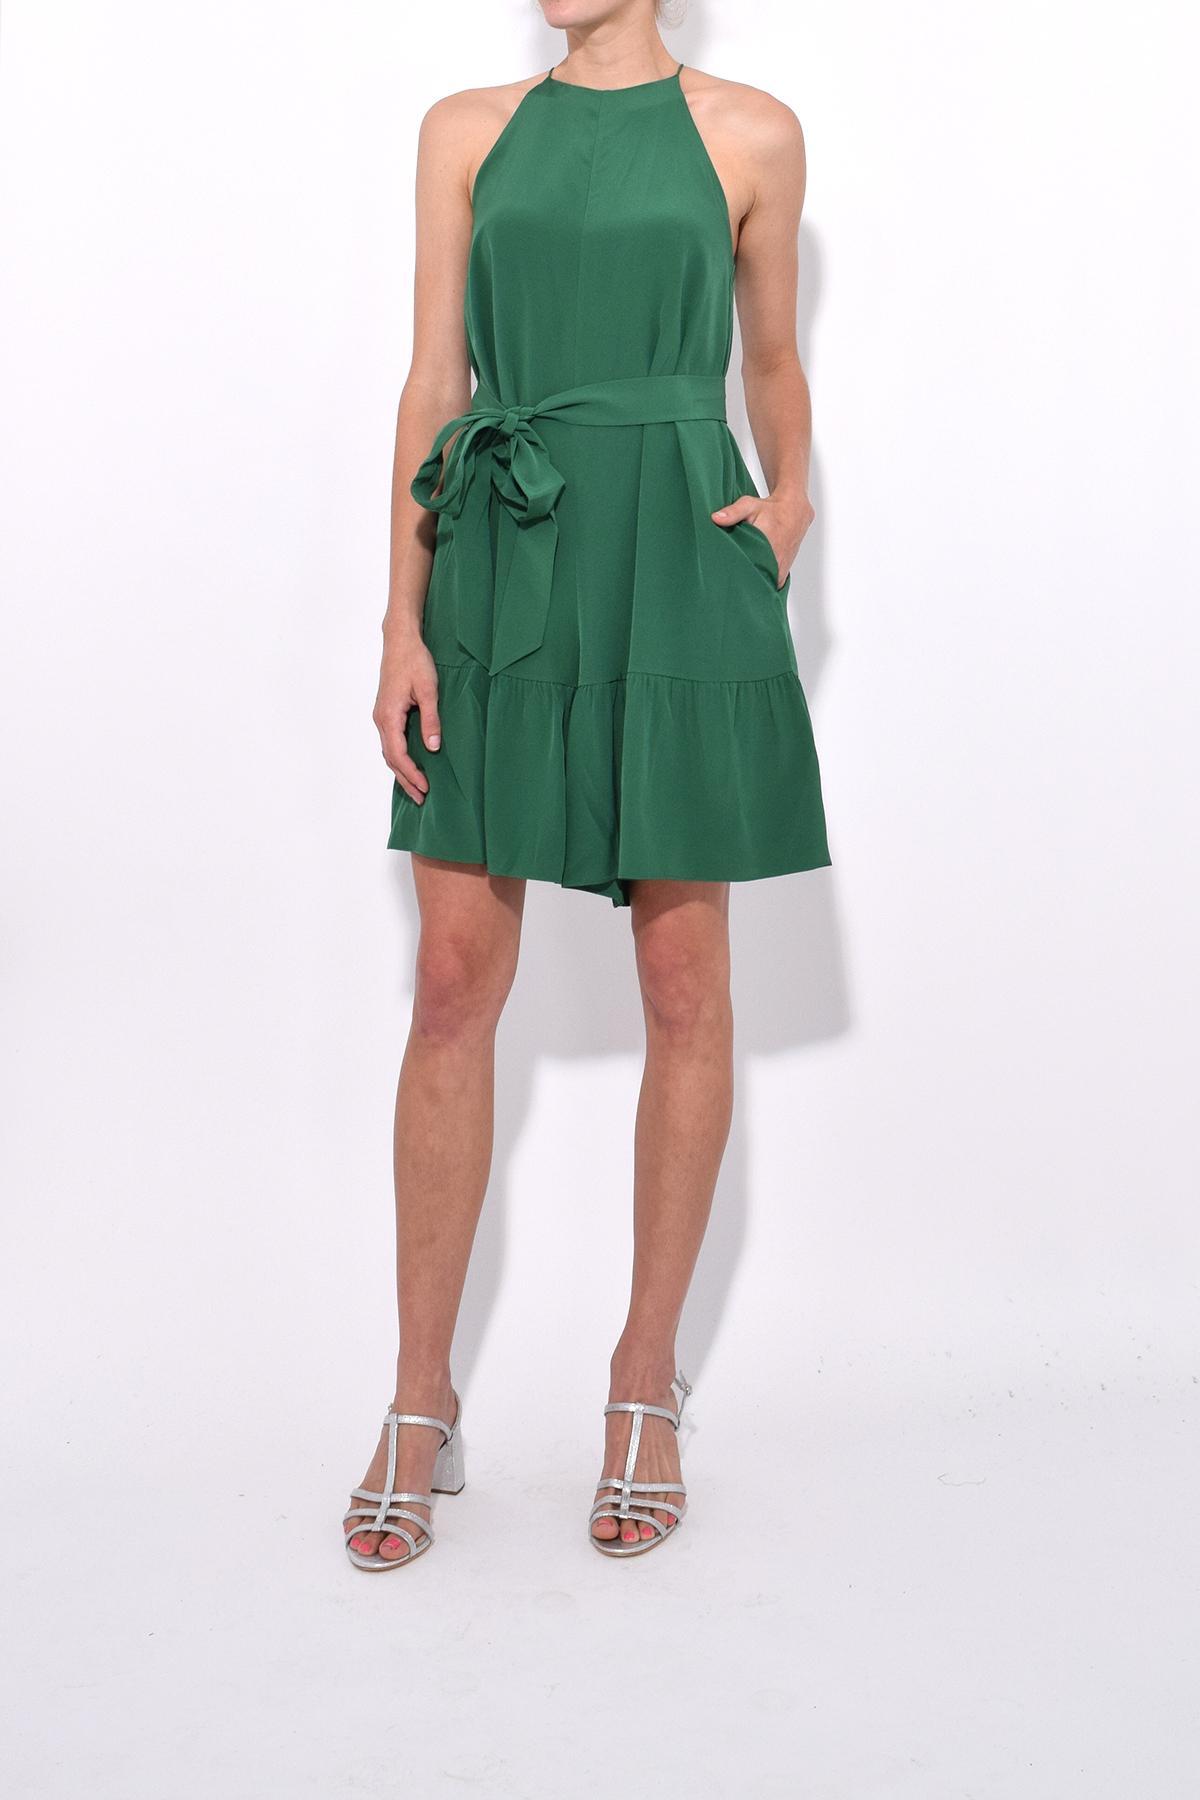 0bc18e2426b Tibi - Green Silk Halter Ruffle Short Jumpsuit - Lyst. View fullscreen